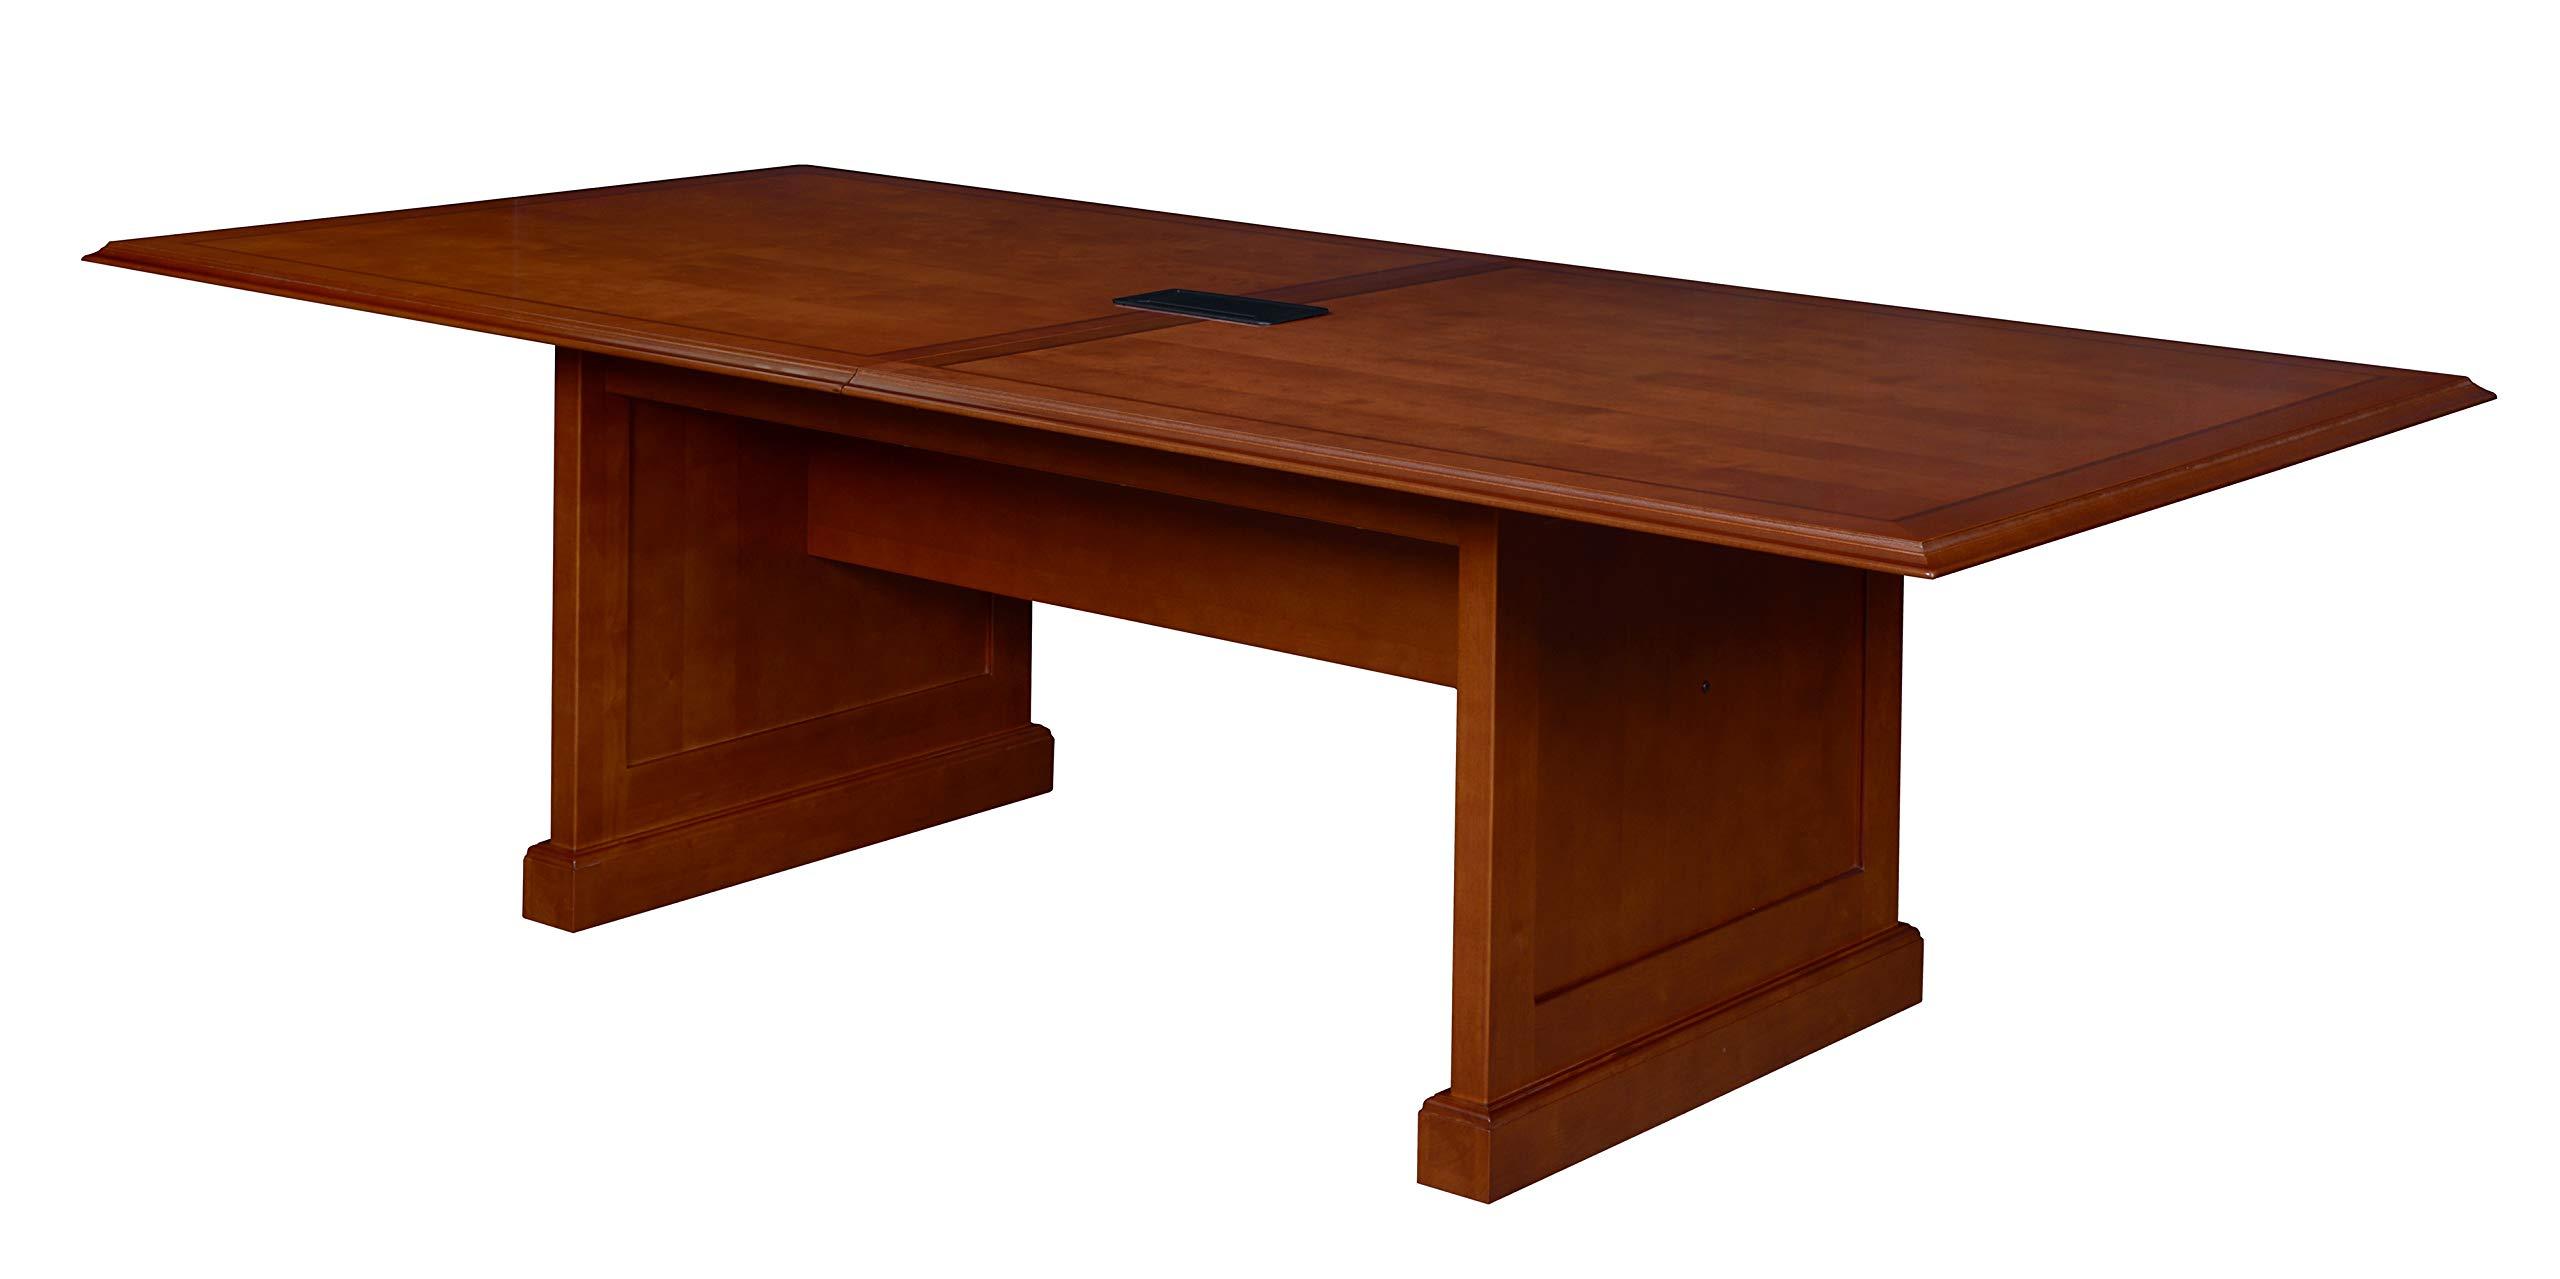 Regency Prestige Traditional Veneer Rectangular Conference Table, 120-inch, Cherry by Regency